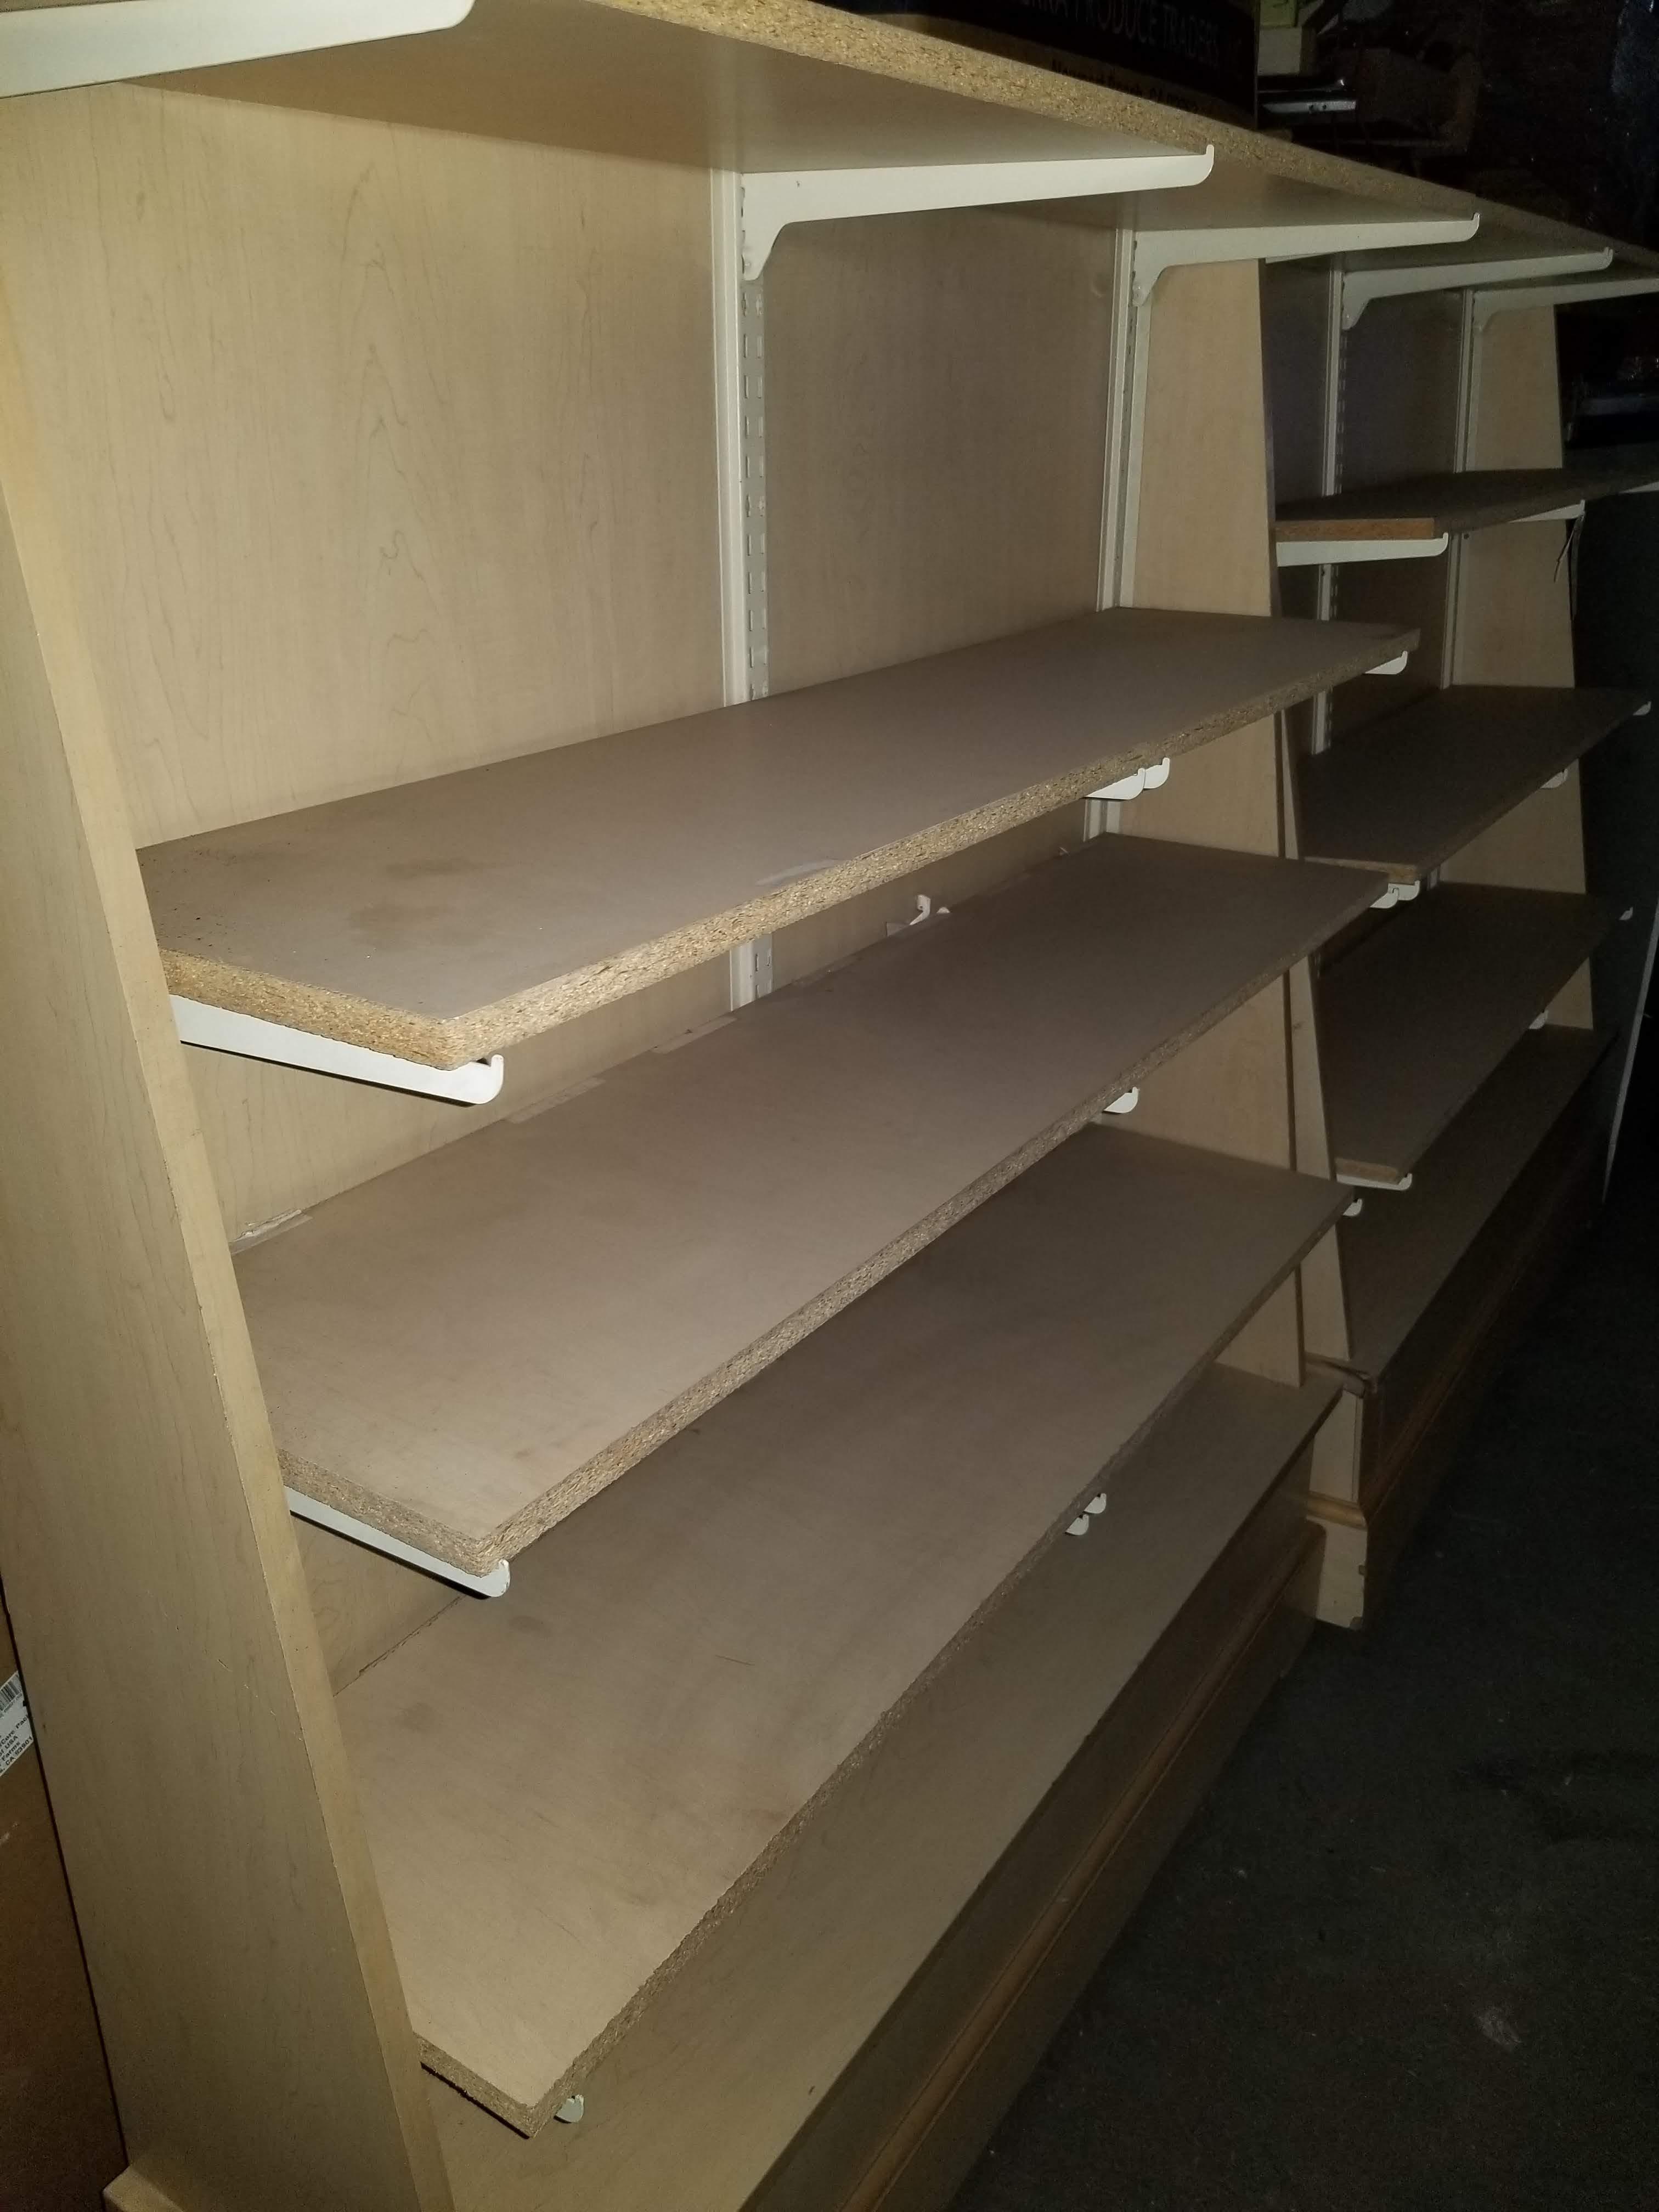 "2 - Wood Display Racks 50""x13""x62"" 5 Shelves - Image 3 of 4"